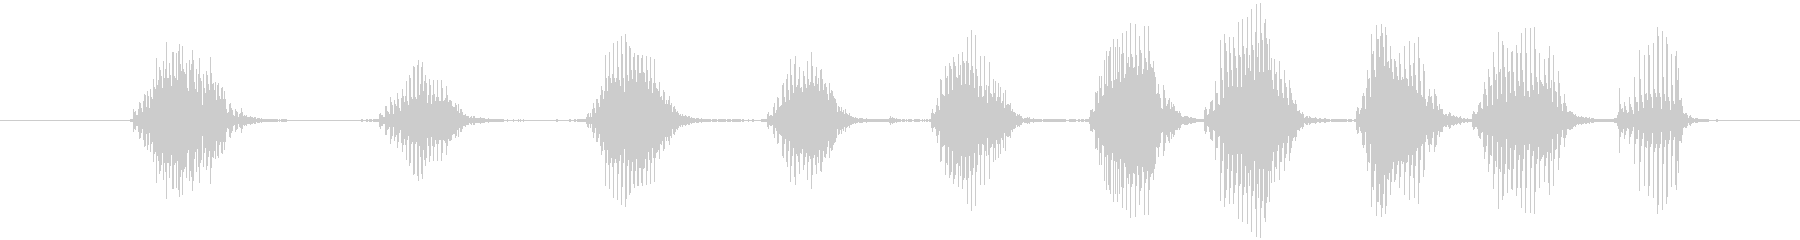 FX ギグルチューブシーケンス01の未再生の波形